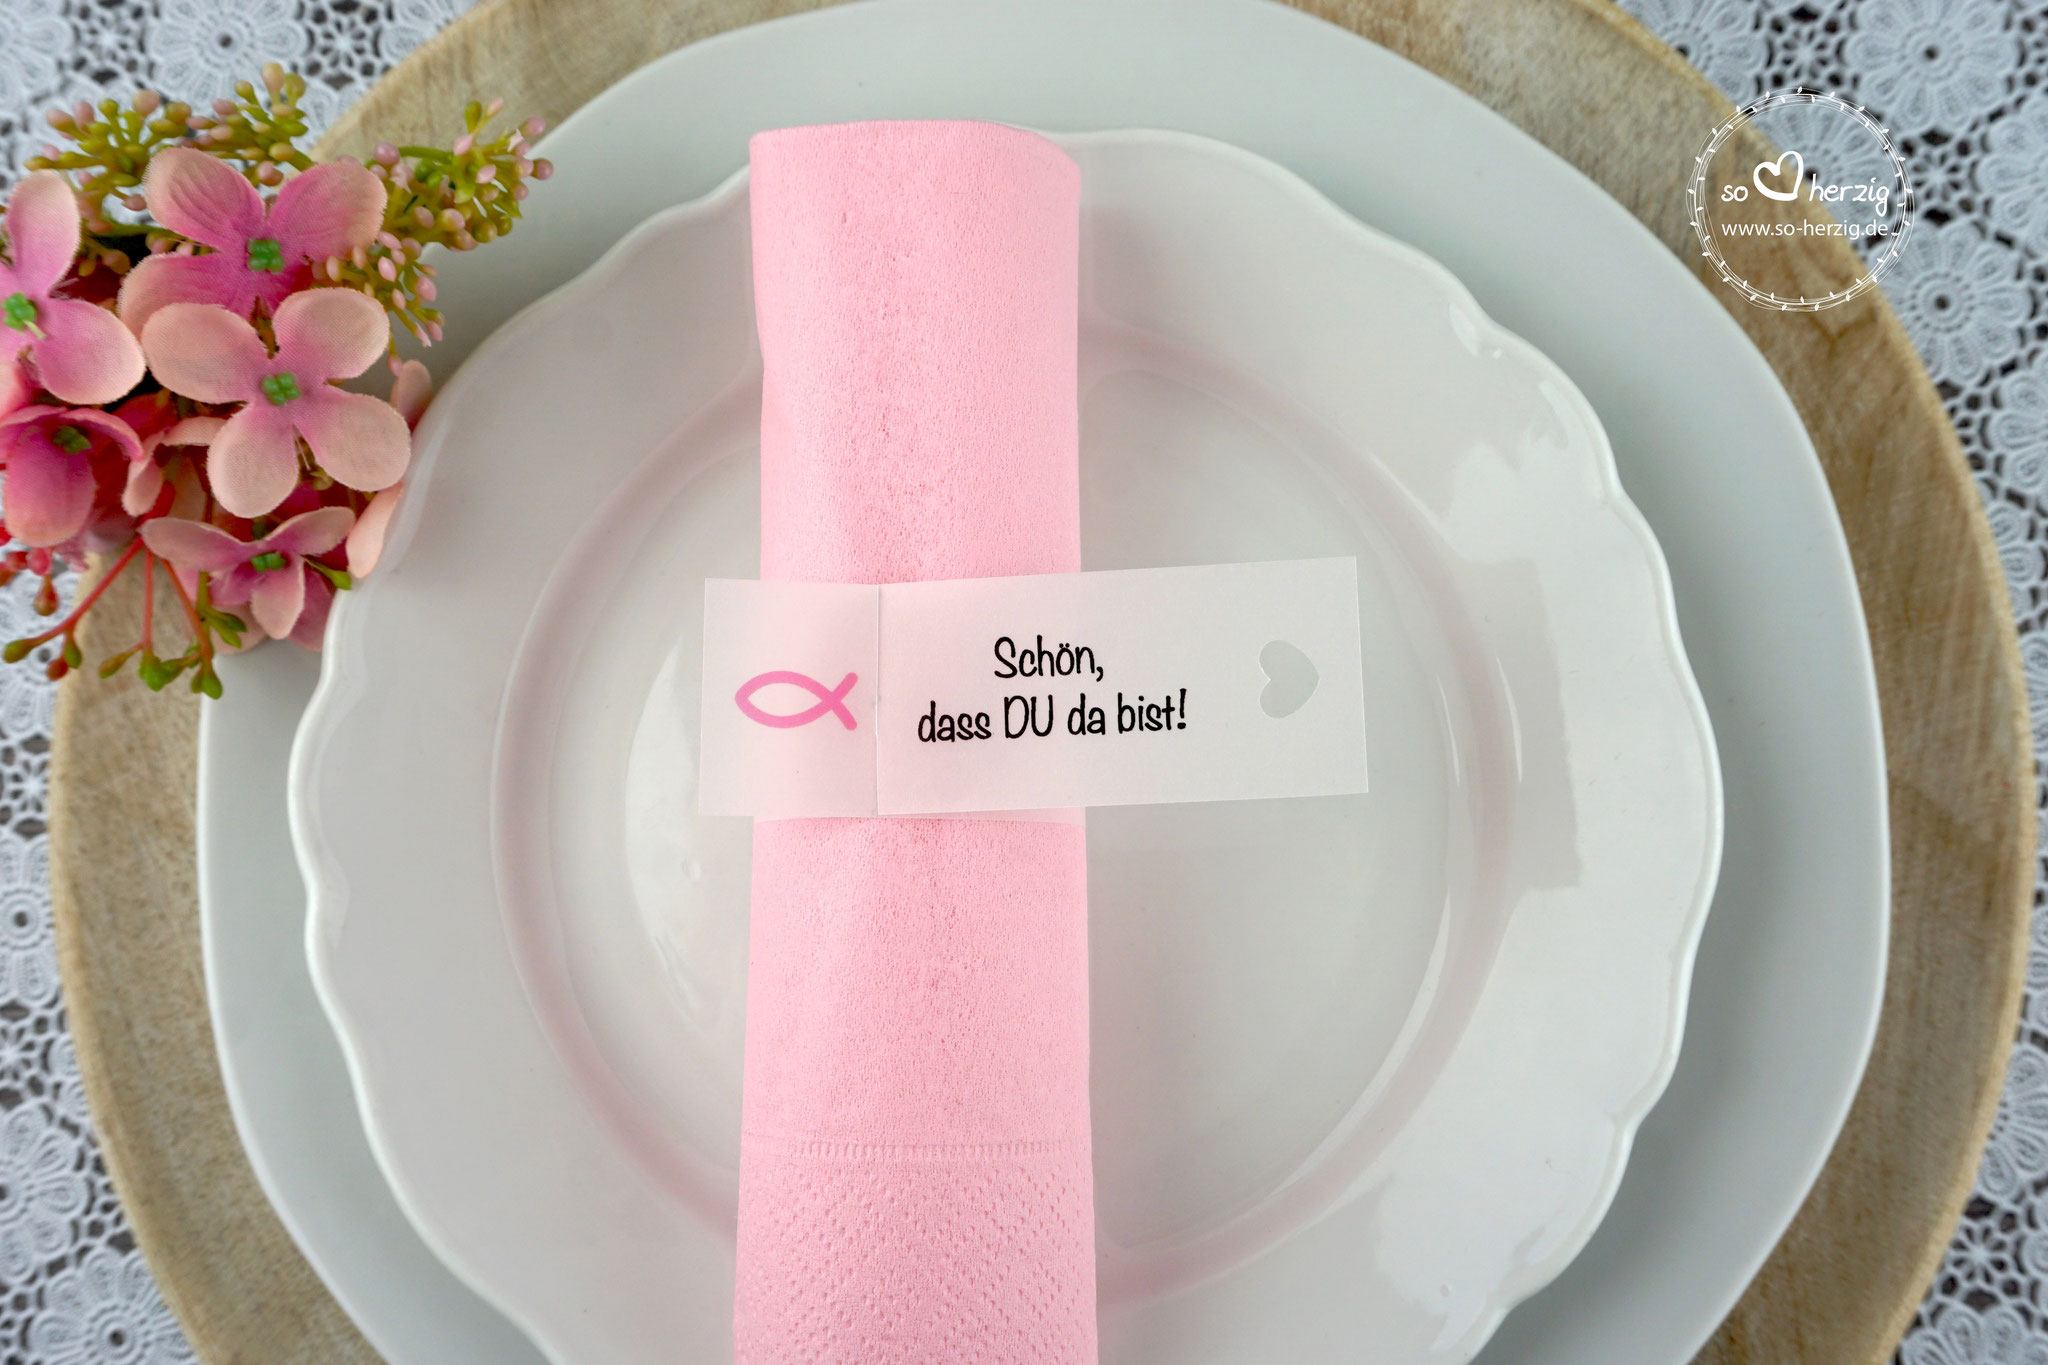 Serviettenring Design Fisch Silhouette, Farbe Rosa, Randabschluss Herz